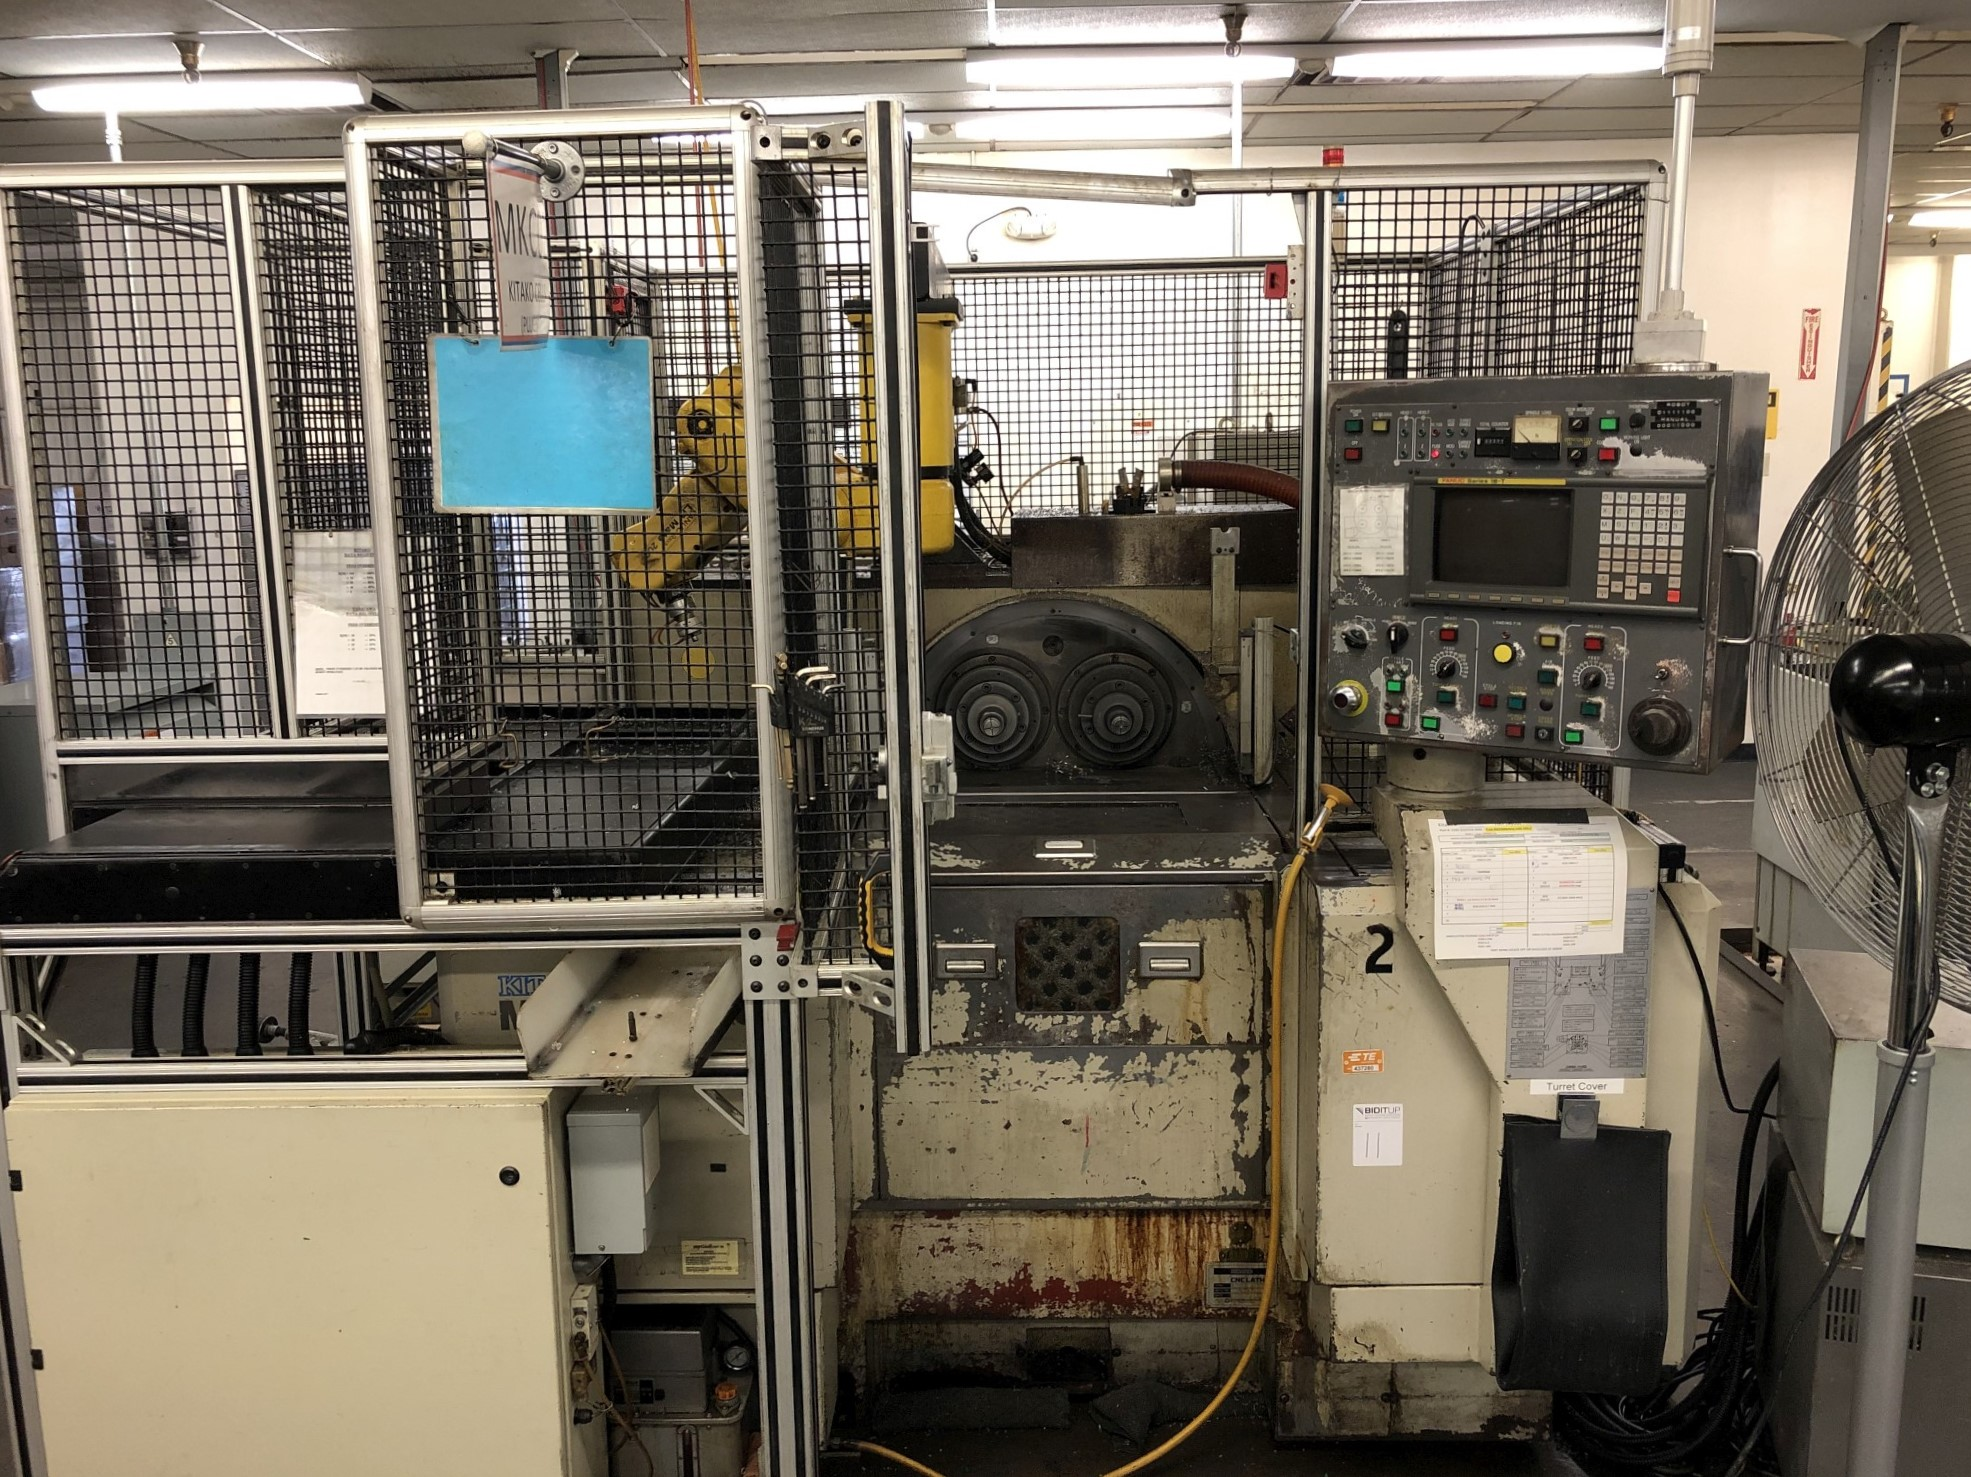 1999 Kitako MT4-200 Multi-Spindle CNC Turning Mill - Image 2 of 17